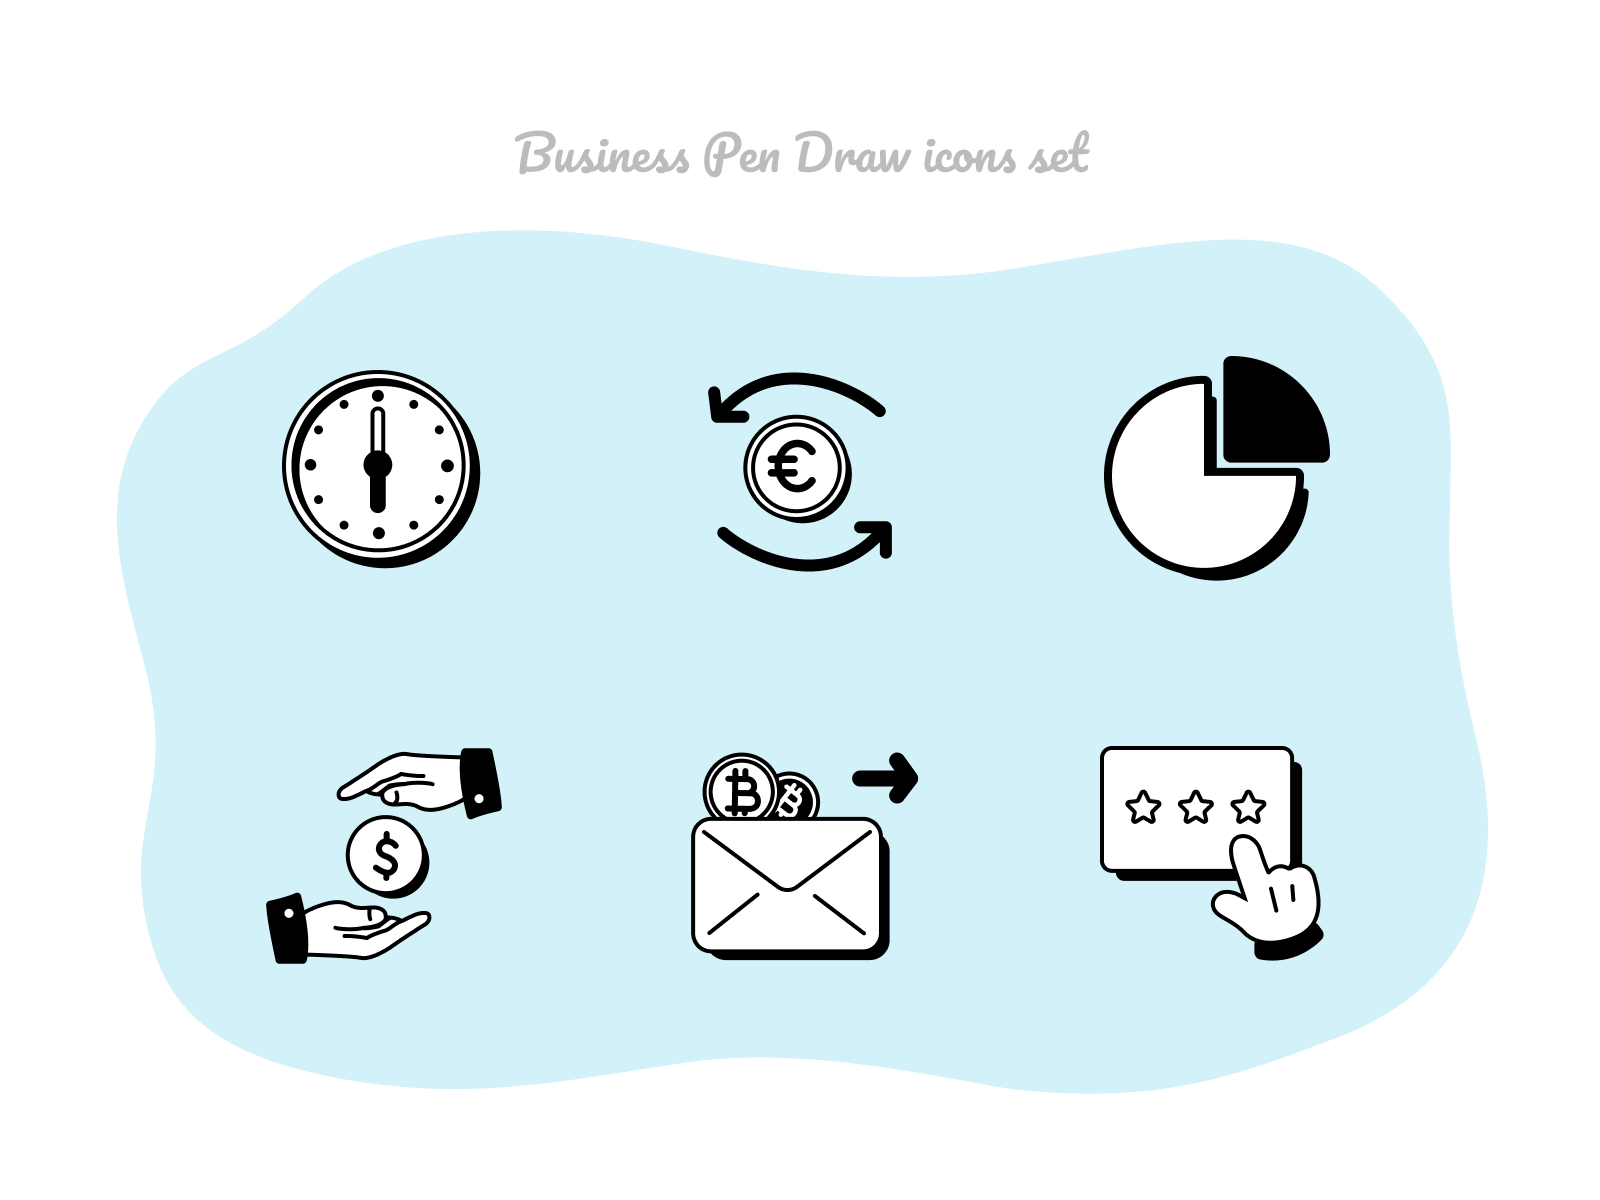 Business Pen Draw icons set #14 bankingapp work time hands glyphs pictograms iconset banking sendmoney rating money business stock icons